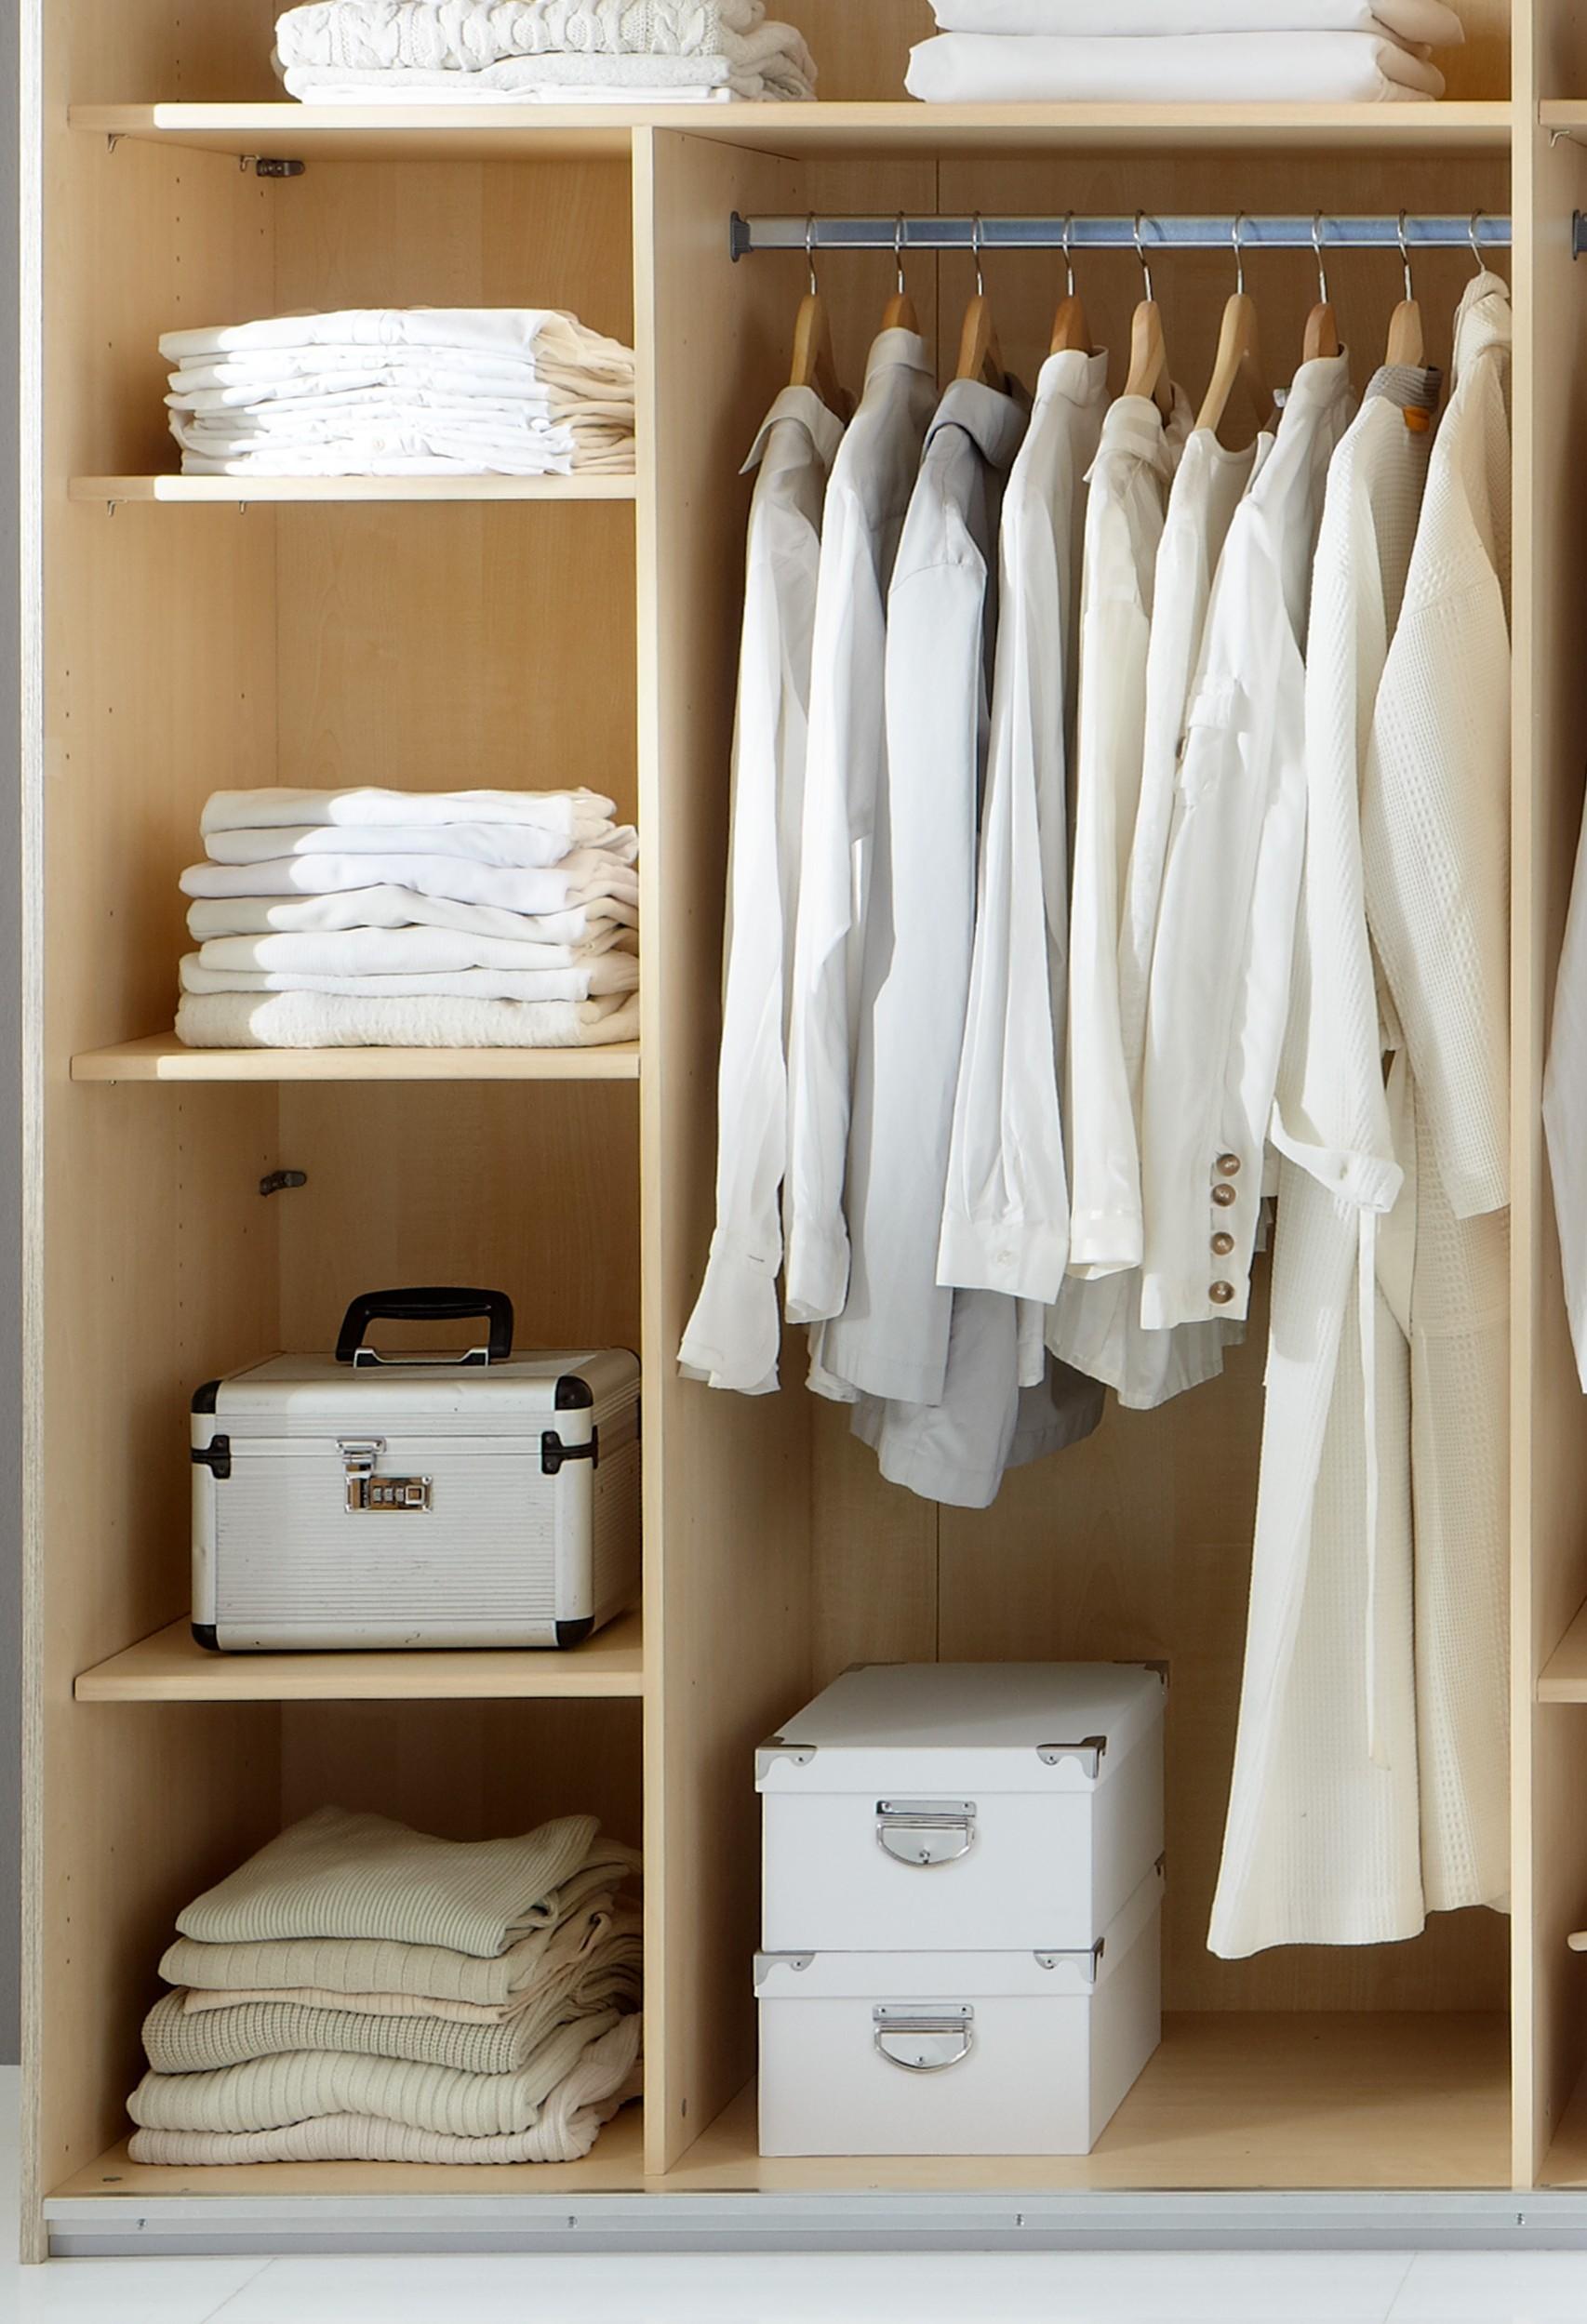 armoire design cuisine idconcept. Black Bedroom Furniture Sets. Home Design Ideas